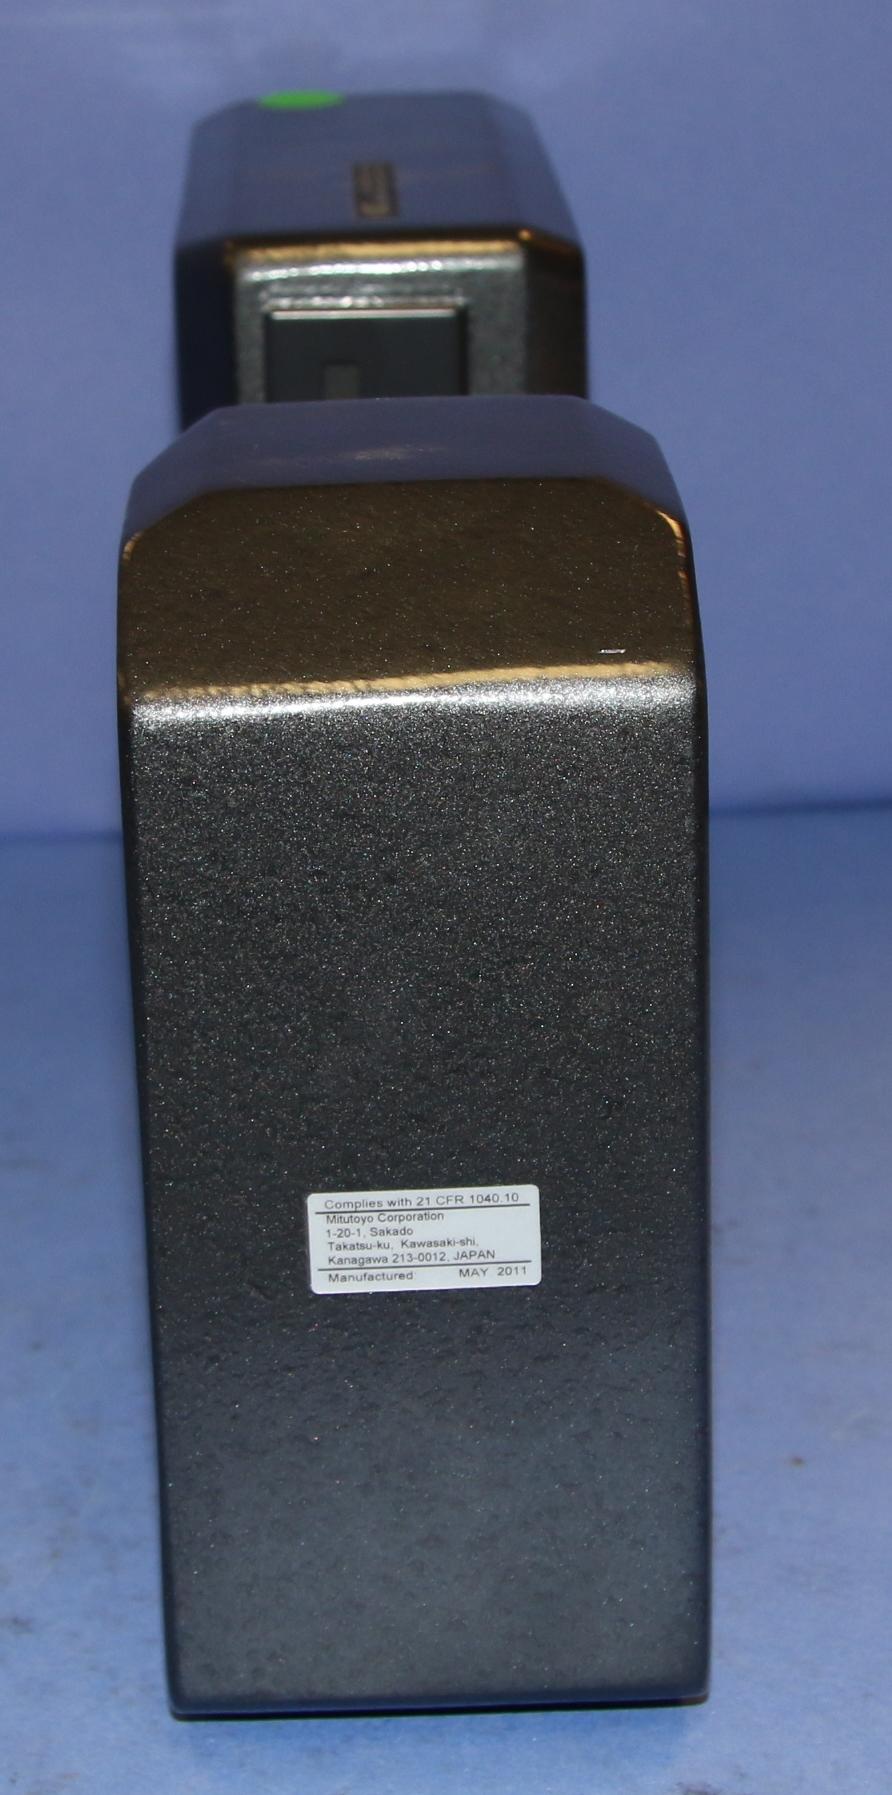 (1) Used Mitutoyo LSM-902 Laser Scan Micrometer